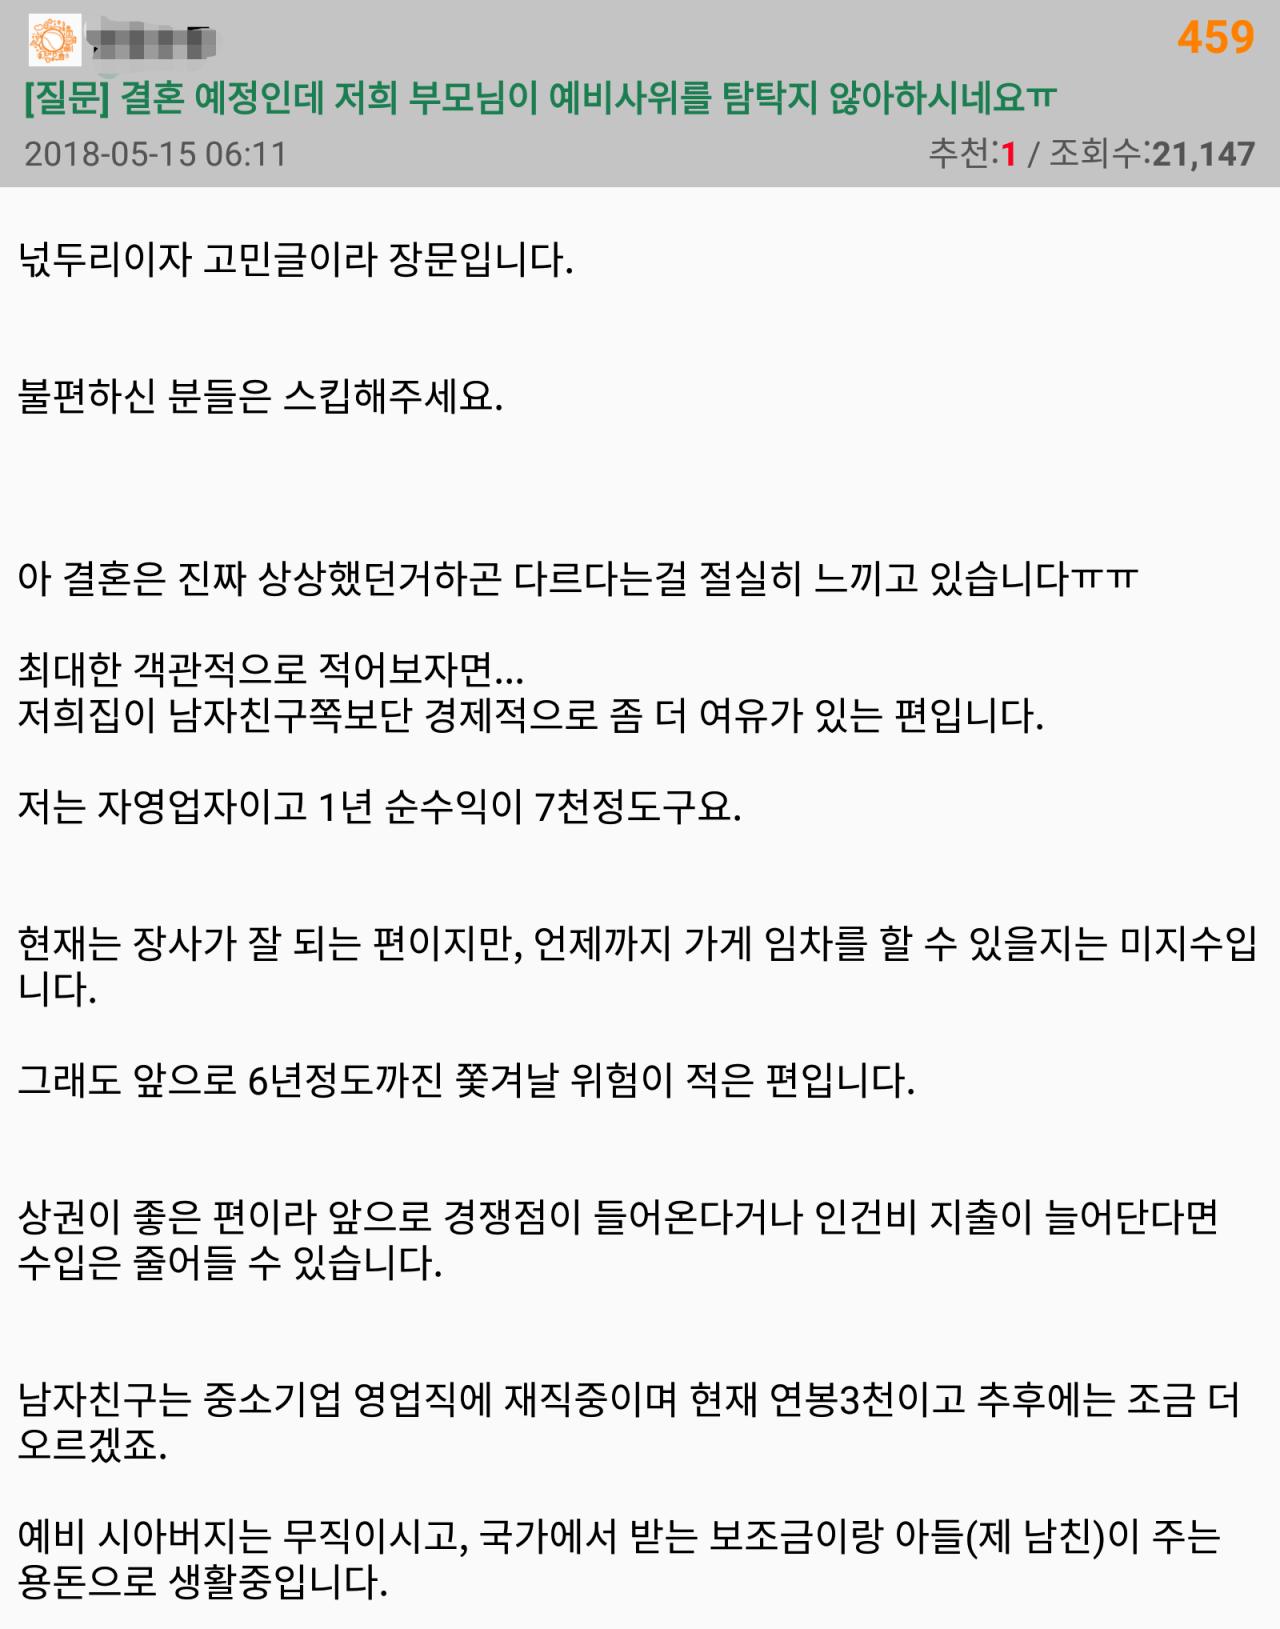 IMG_20180515_133352.png 현재 엠팍에서 댓글 500개 넘긴 예비신부 사연.jpg